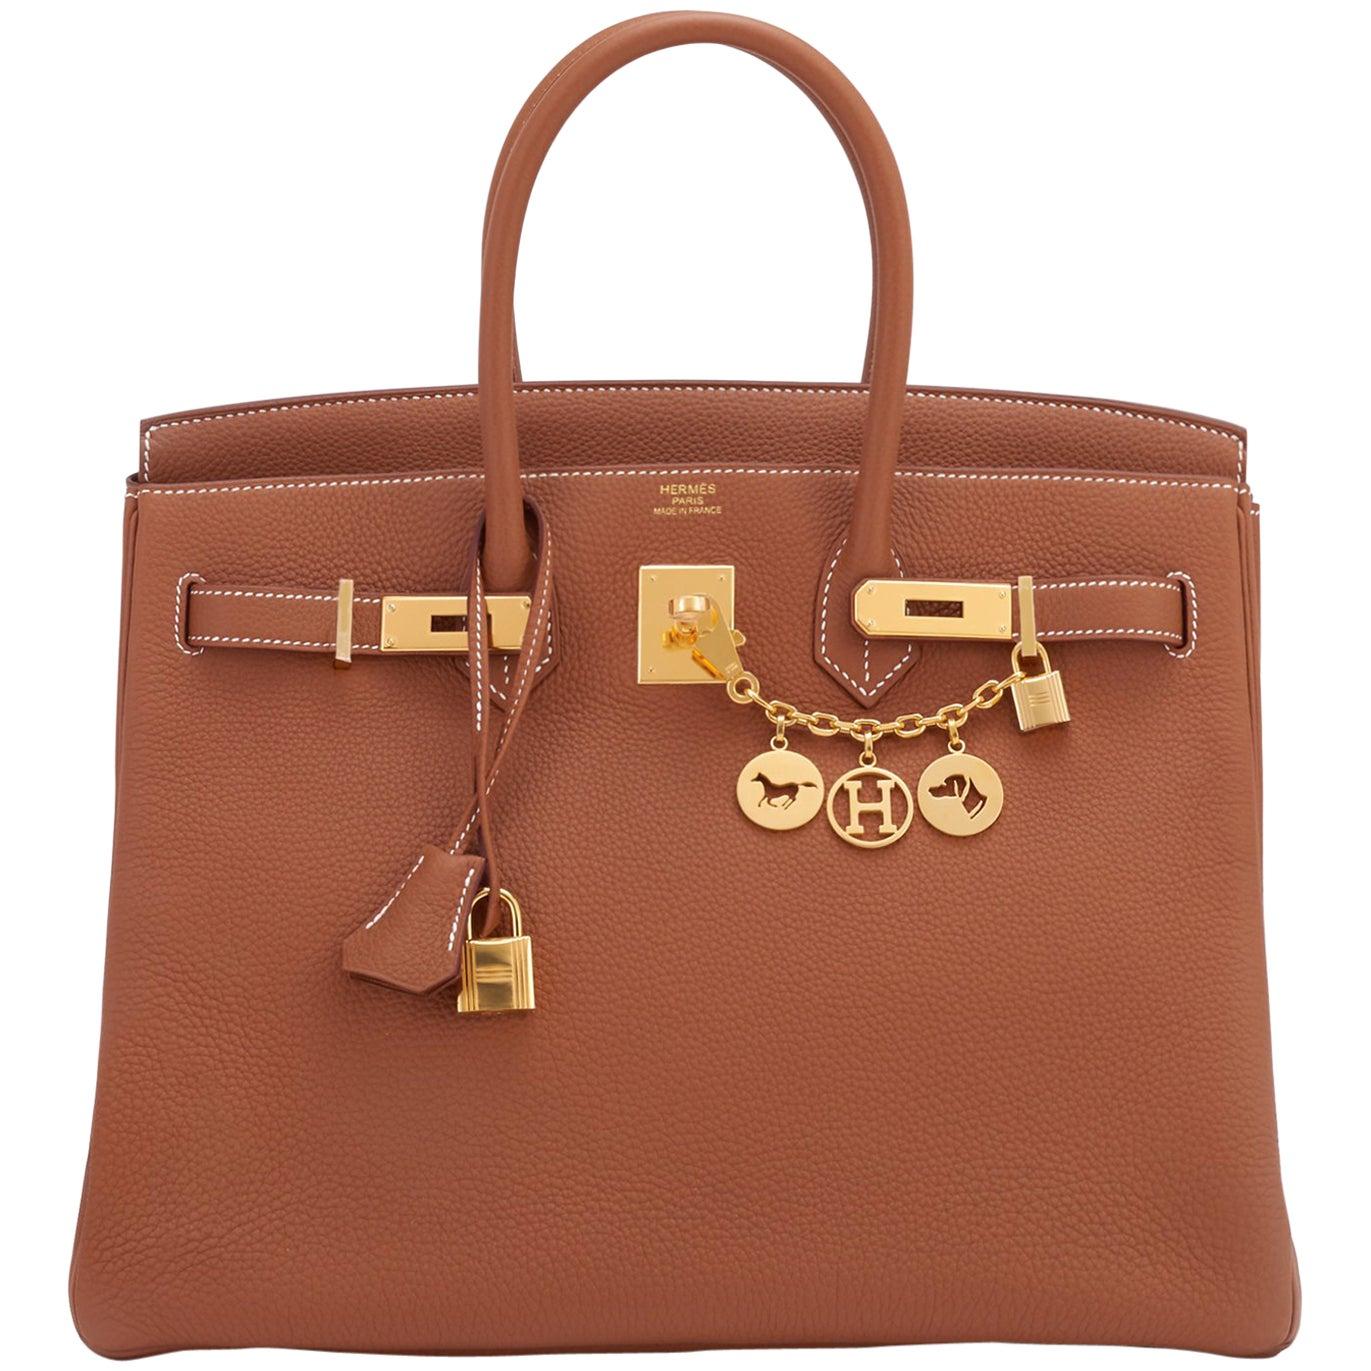 2b3f8fbeaa6a Hermes Gold Togo 35cm Camel Tan Gold Hardware A Stamp Birkin Bag For Sale  at 1stdibs